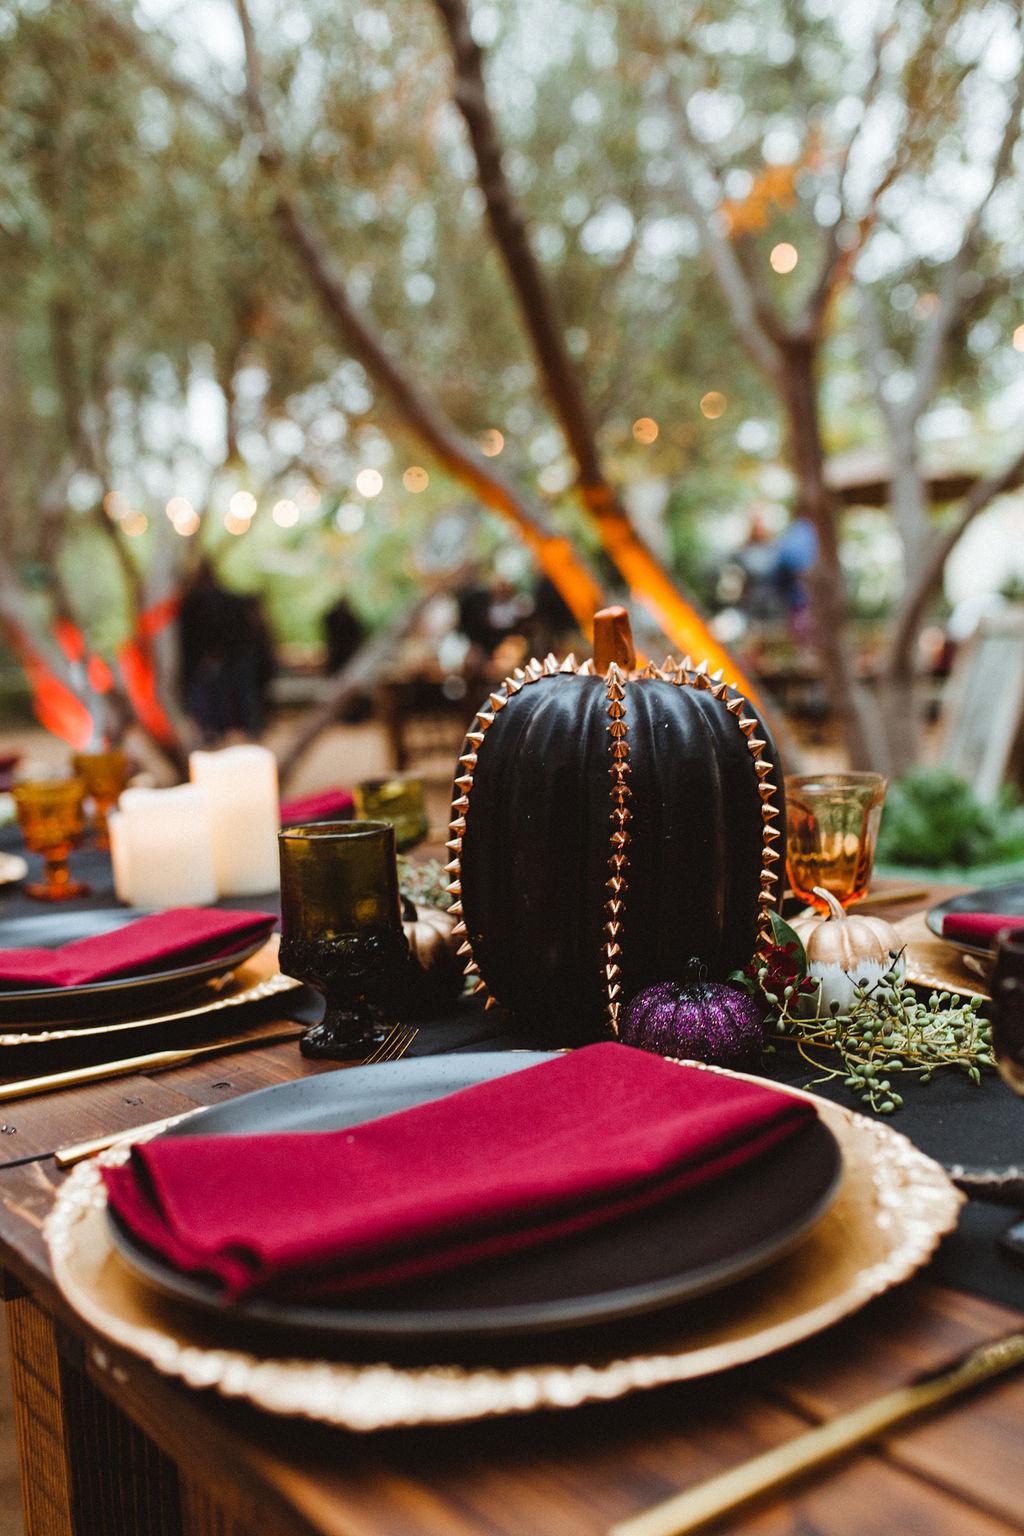 October-Details-Wedding-Pasadena-California-Halloween-Tim-Burton-Alice-Wonderland-Whimsical-Hieusz-Photography-44.jpg